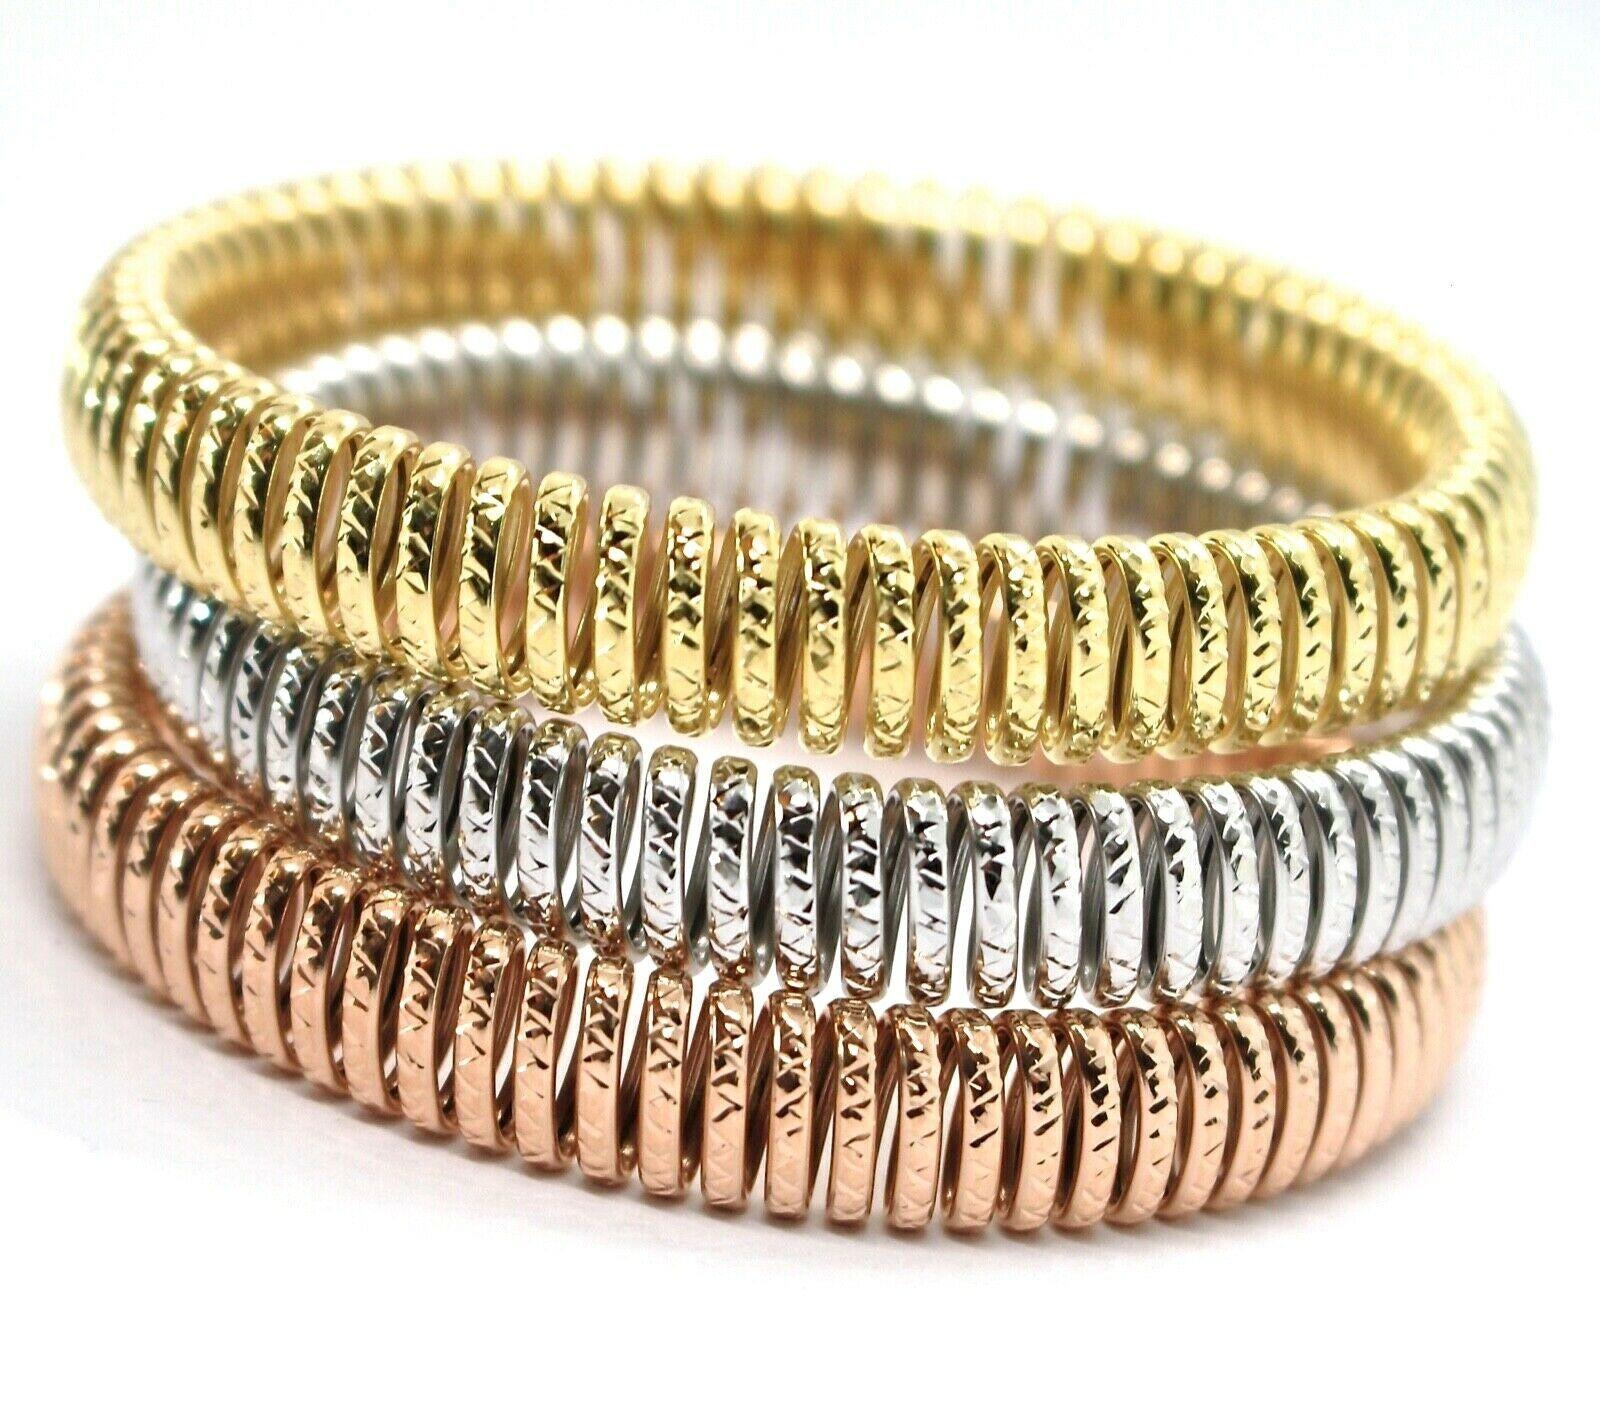 GOLD BRACELET 750 18K, YELLOW 0,5 WHITE 0,5 PINK, SEMI-RIGID, MILLED, ELASTIC